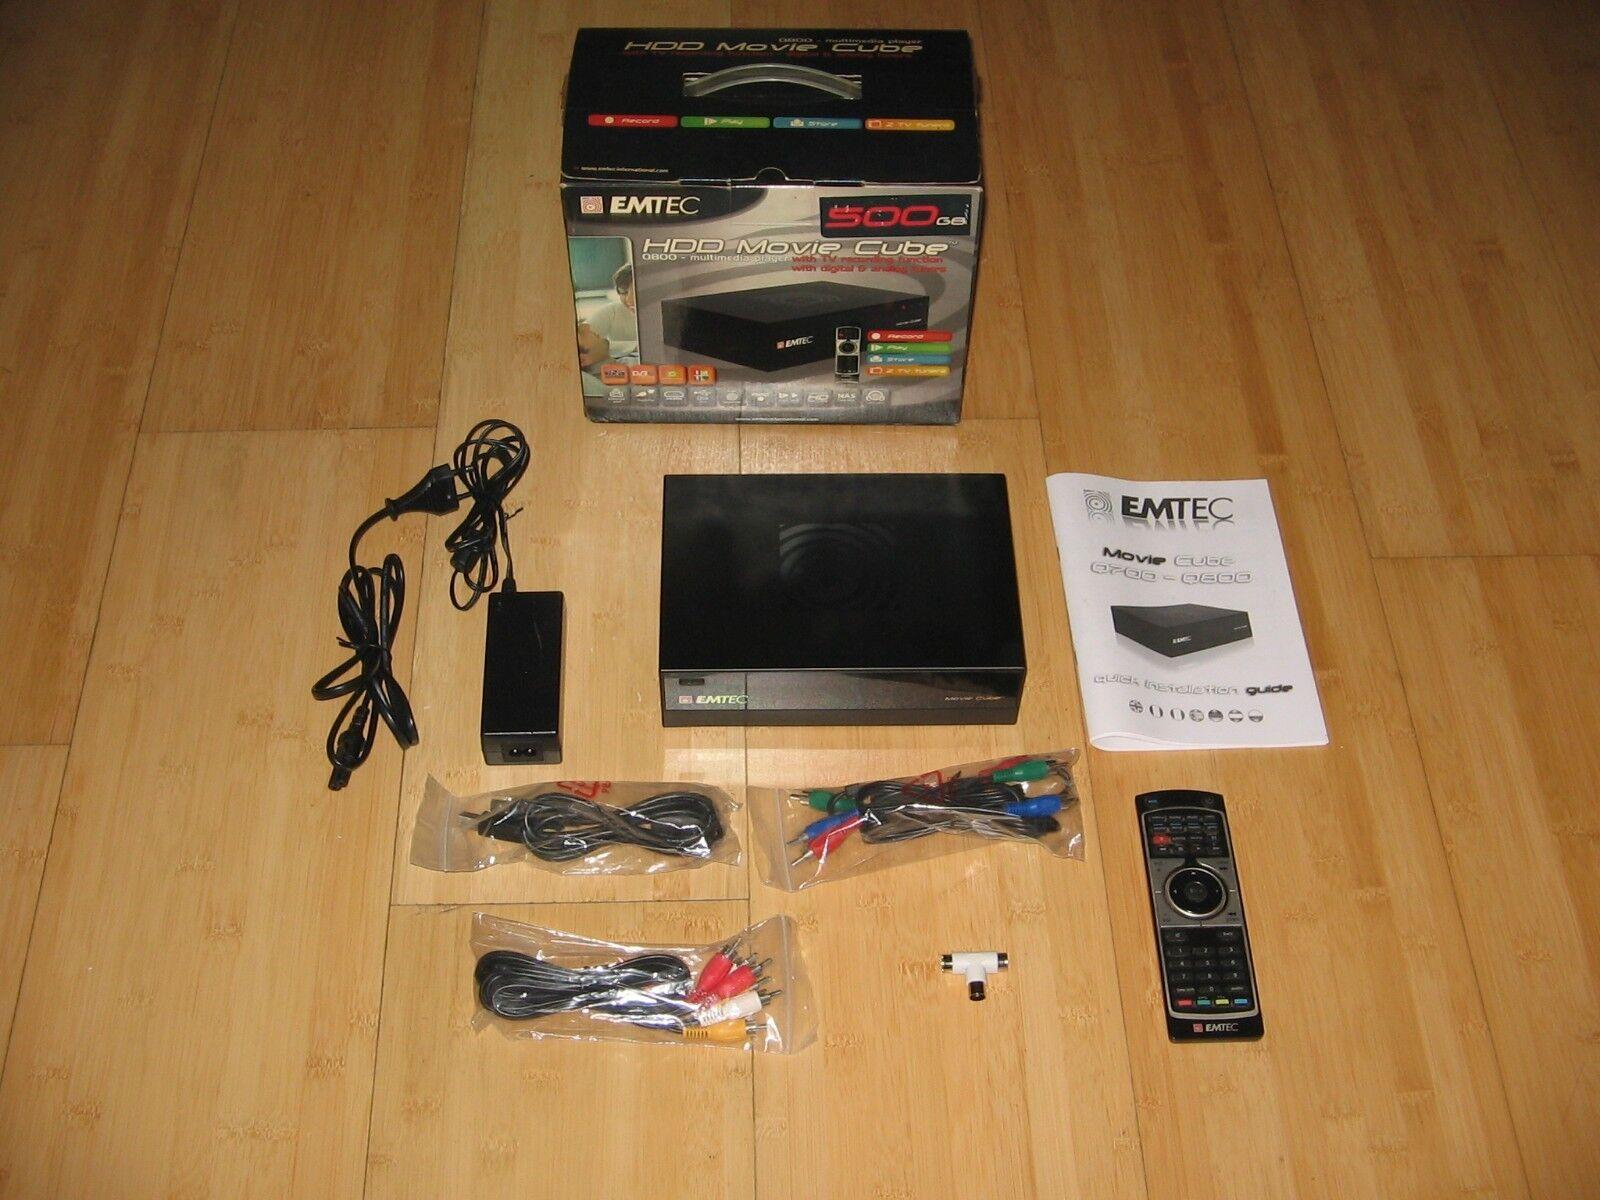 EMTEC HDD Movie Cube Q800 Multimedia-Player 500GB Festplatte Aufnahmefunktion